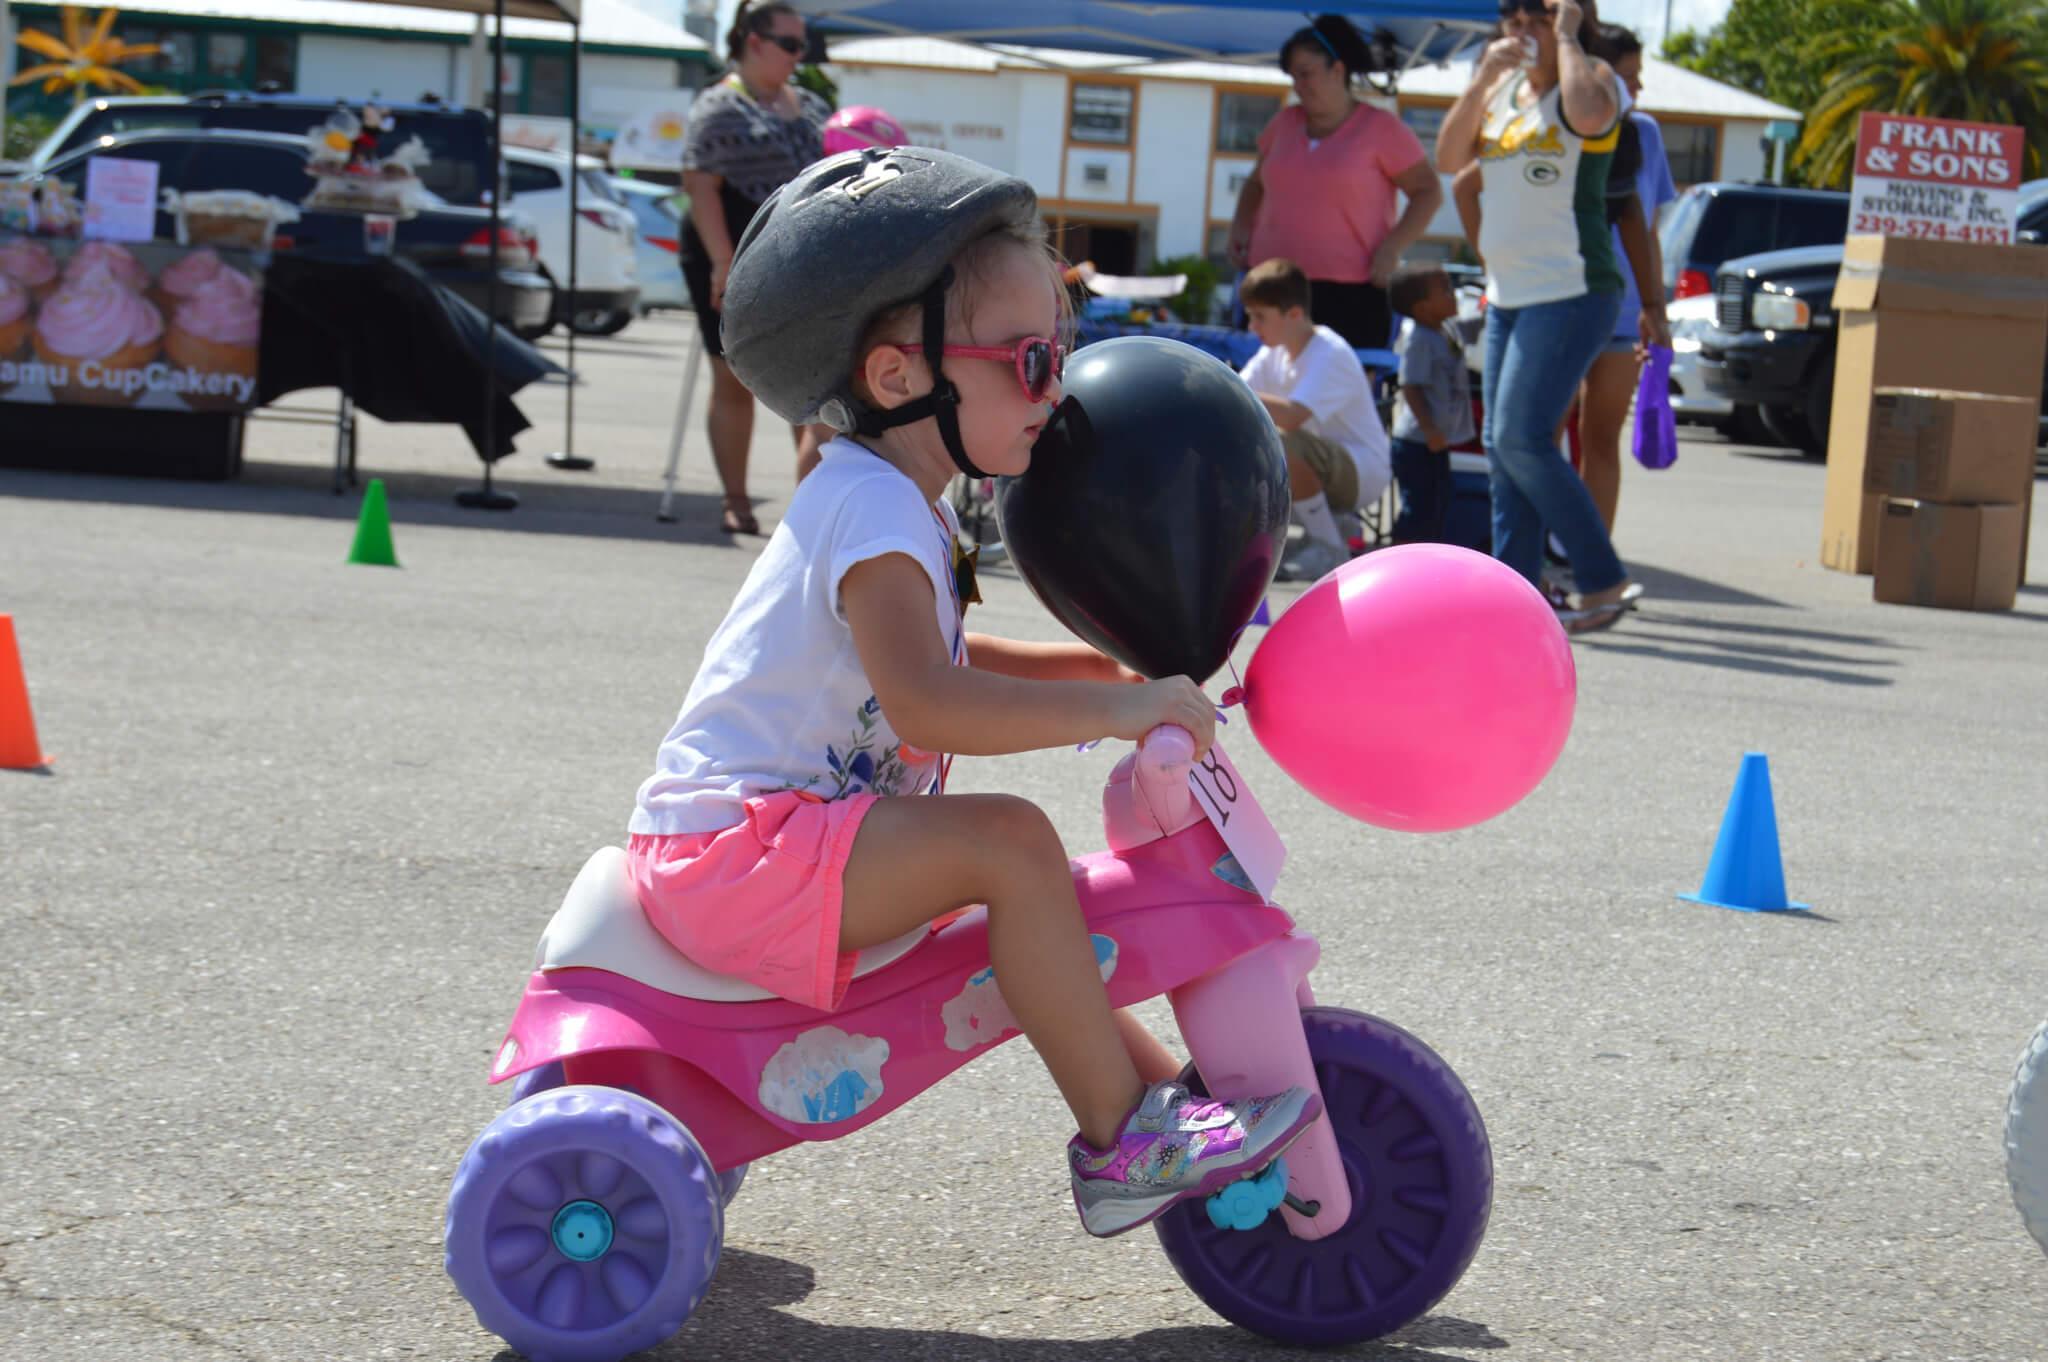 Trike-A-Thon Races Through SWFL